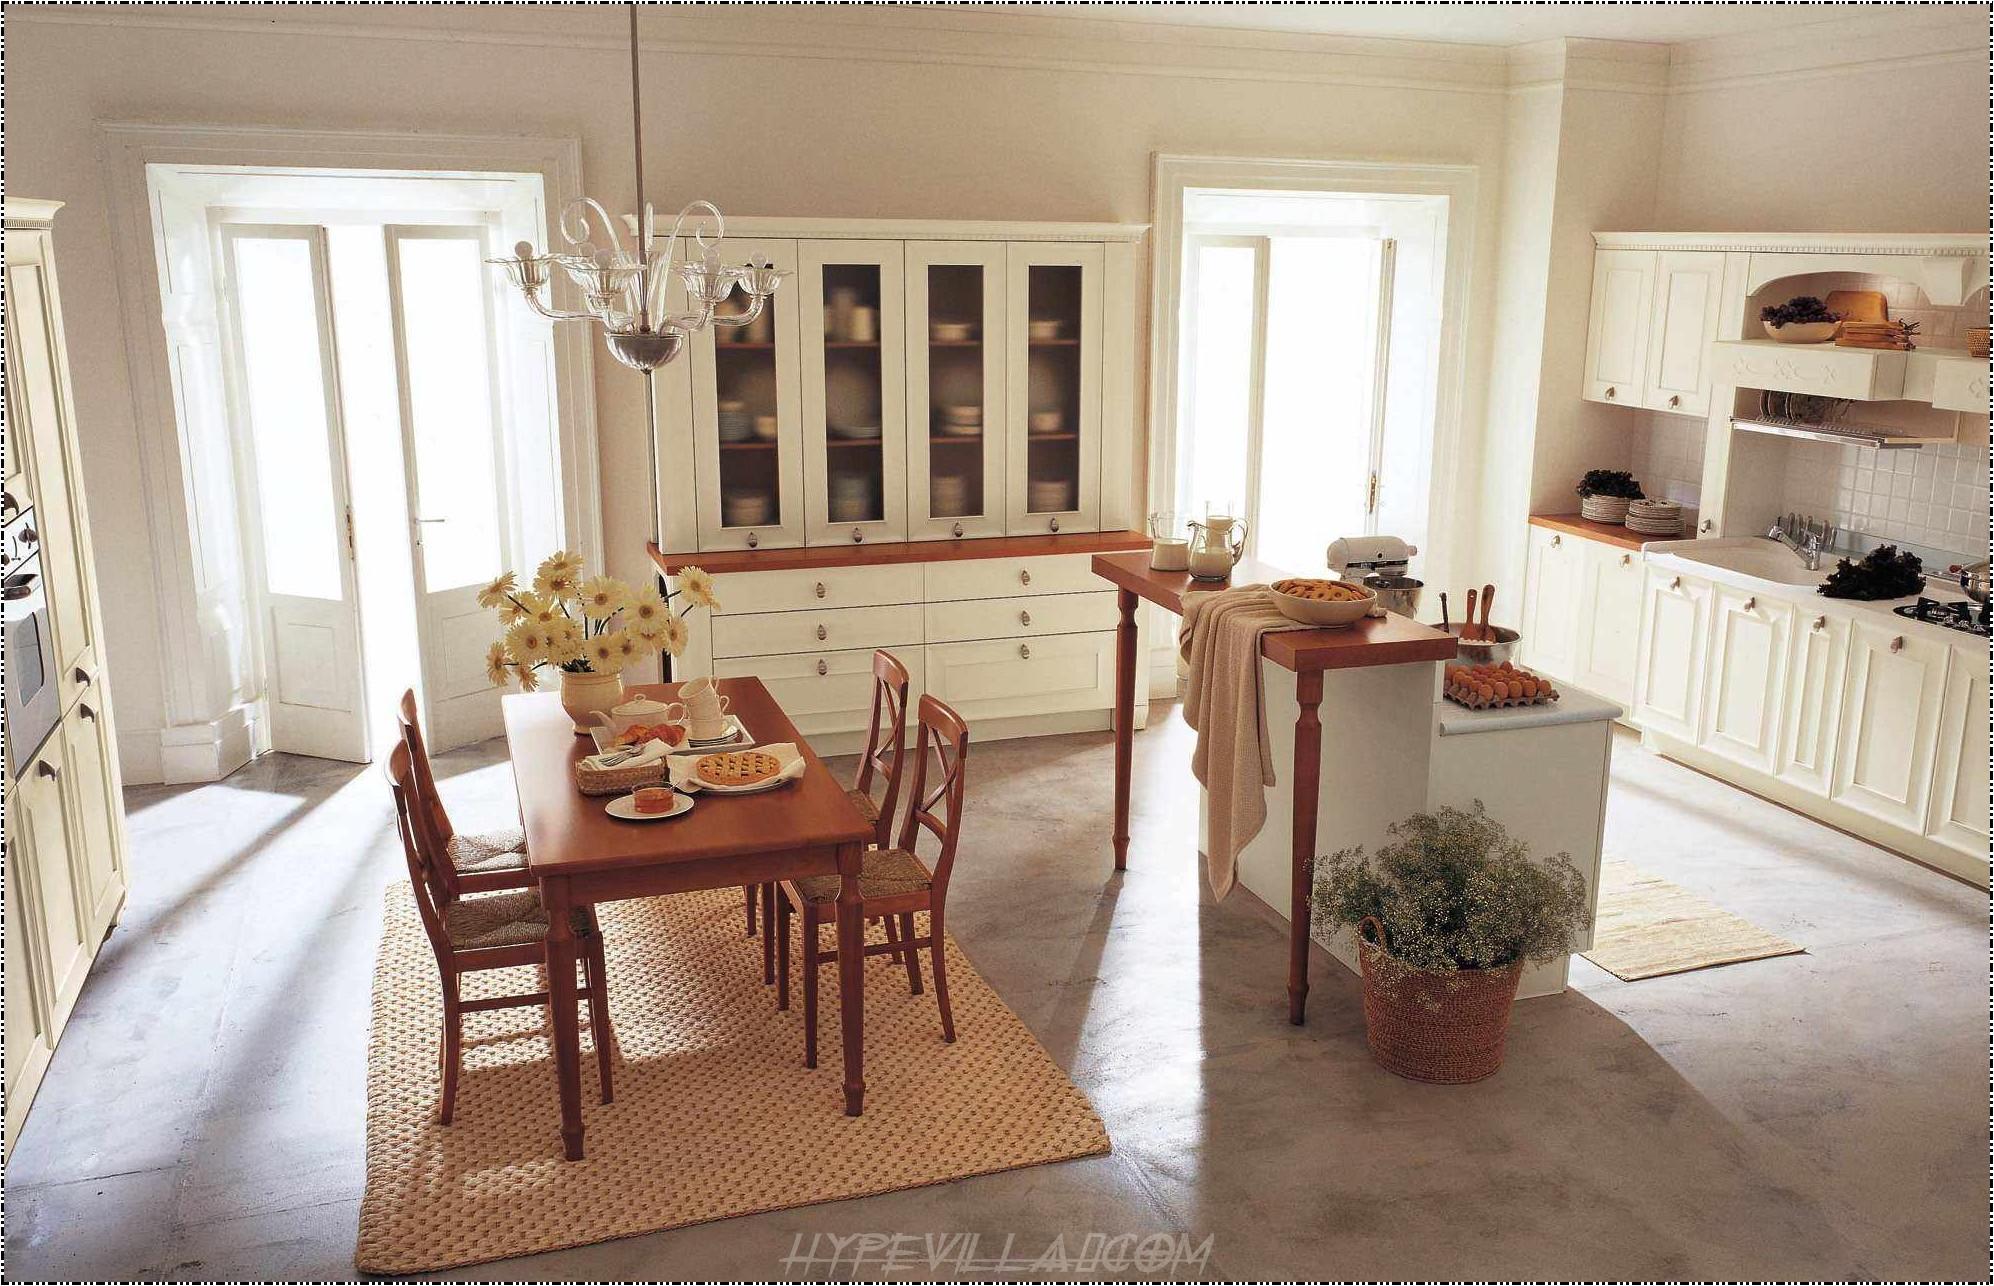 interior house design kitchen 22 home plans interior designs for beach house designs interior interior picture interior house designs